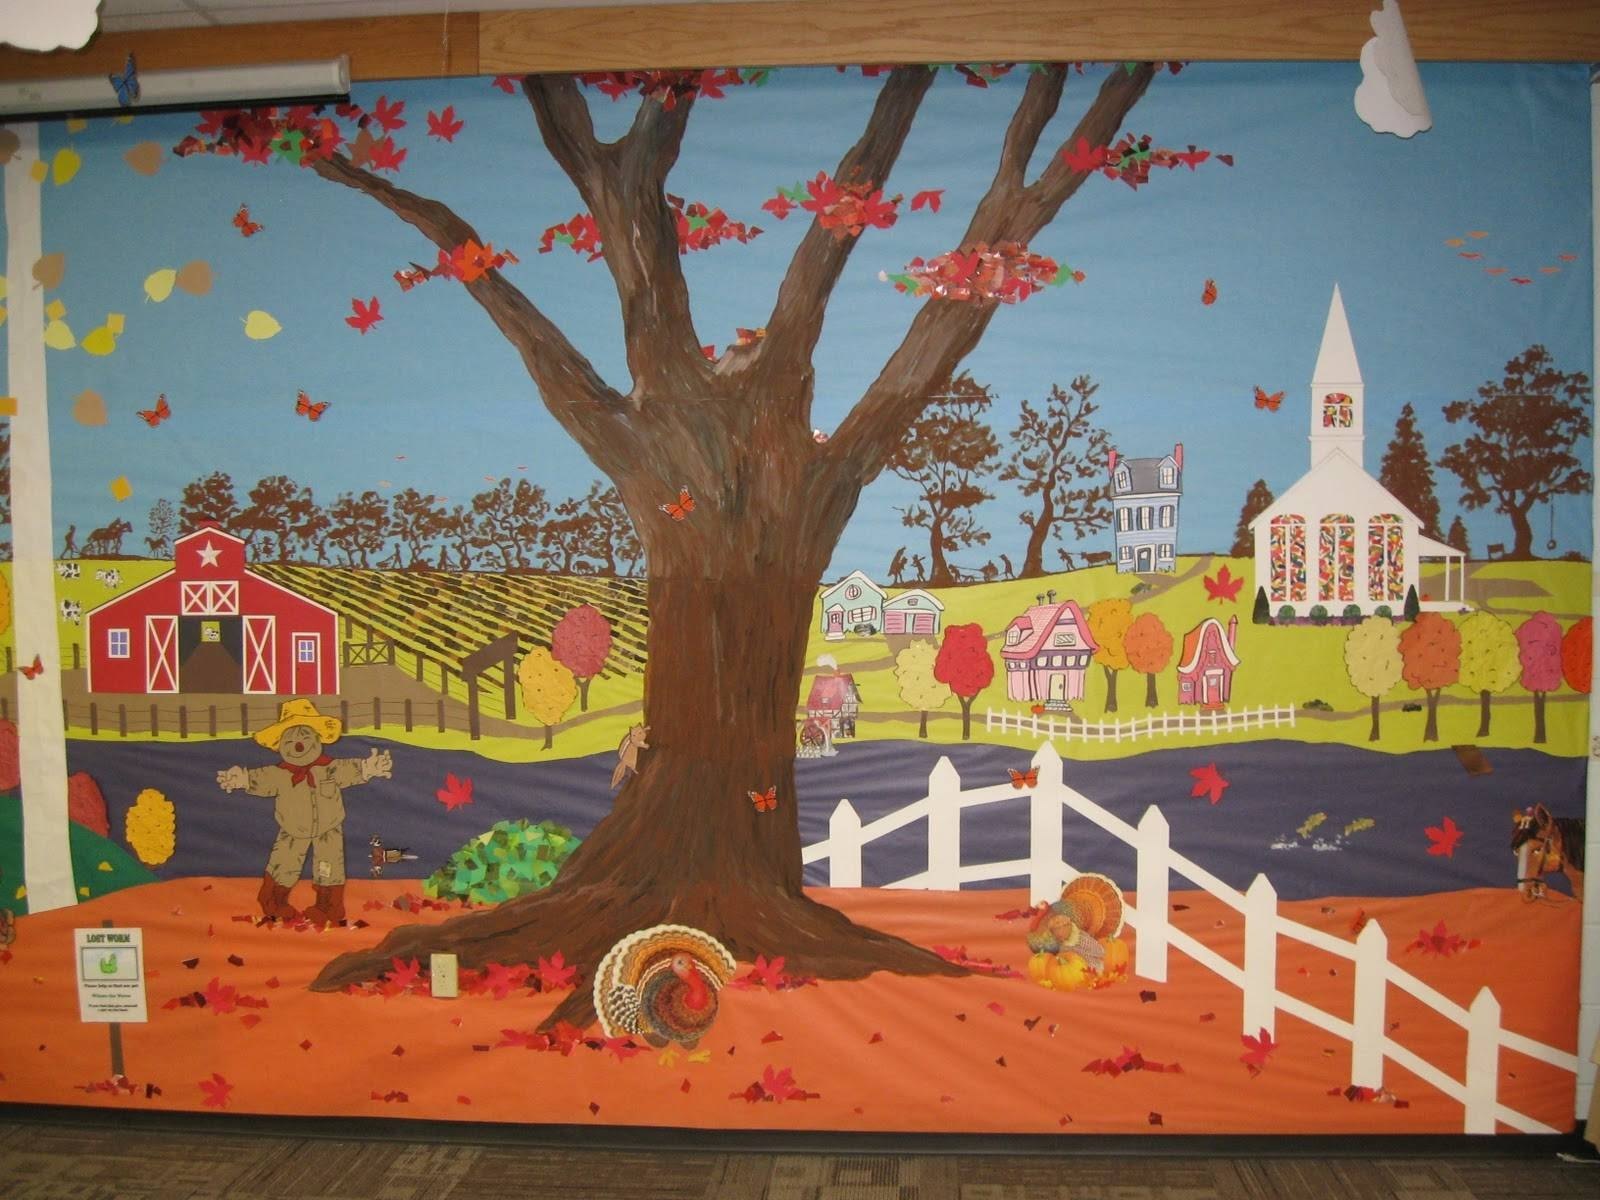 Autumn Classroom Bulletin Board Ideas With Regard To Latest Preschool Wall Art (Gallery 23 of 30)